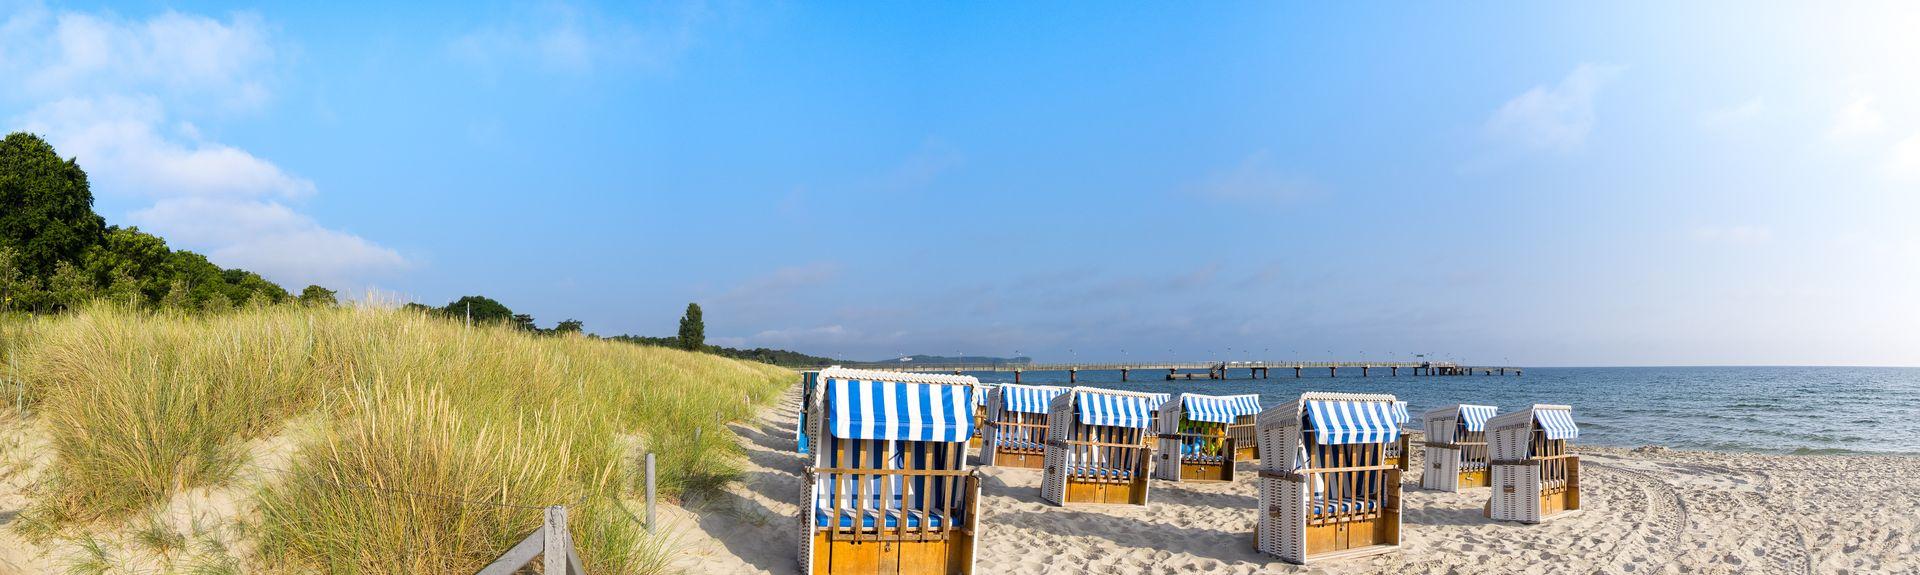 Baabe, Mecklenburg-Vorpommern, Germany